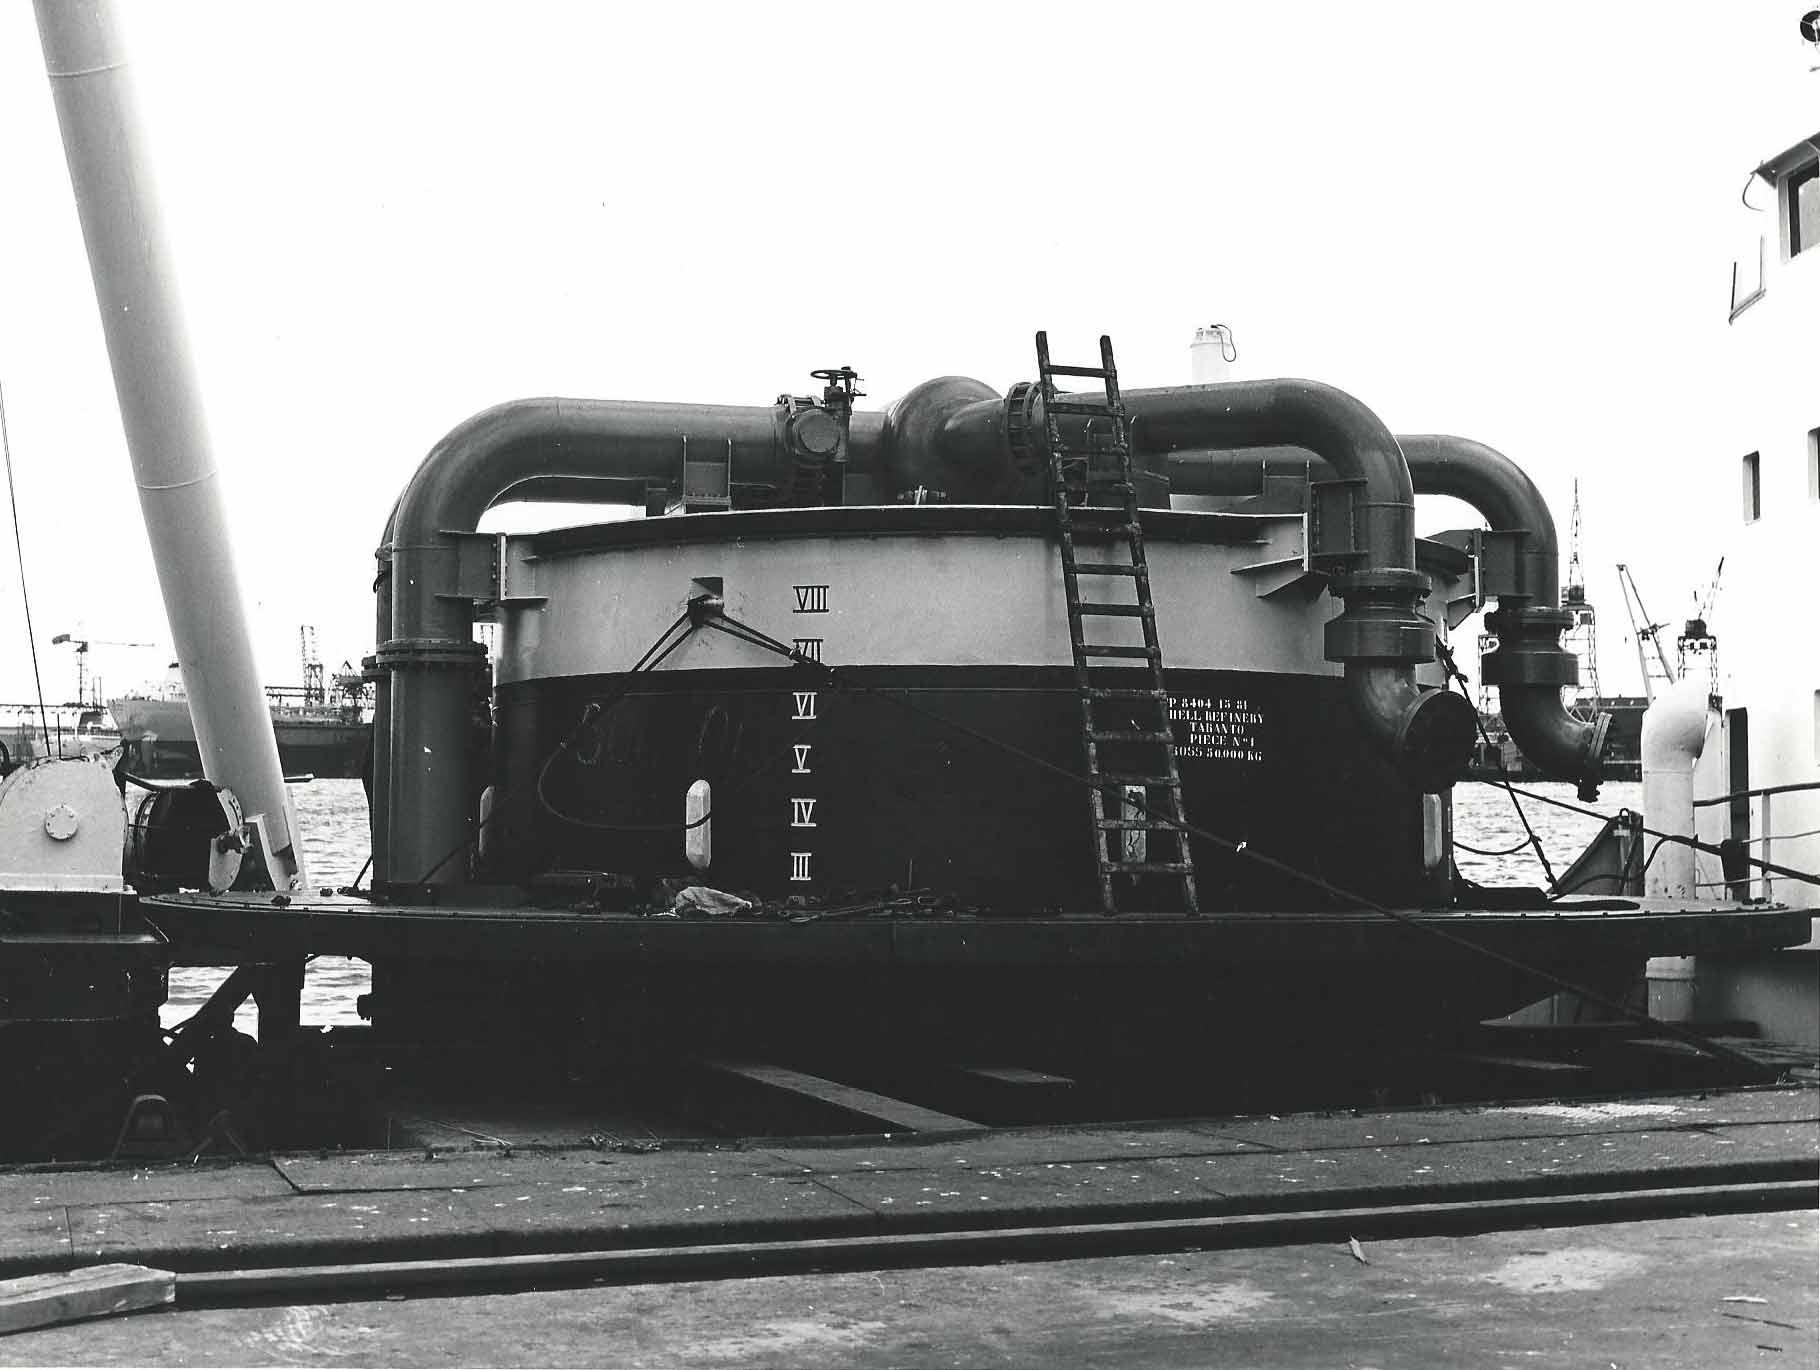 Co. 853: Tobanto S.B.M. (Meerboei) (1969)